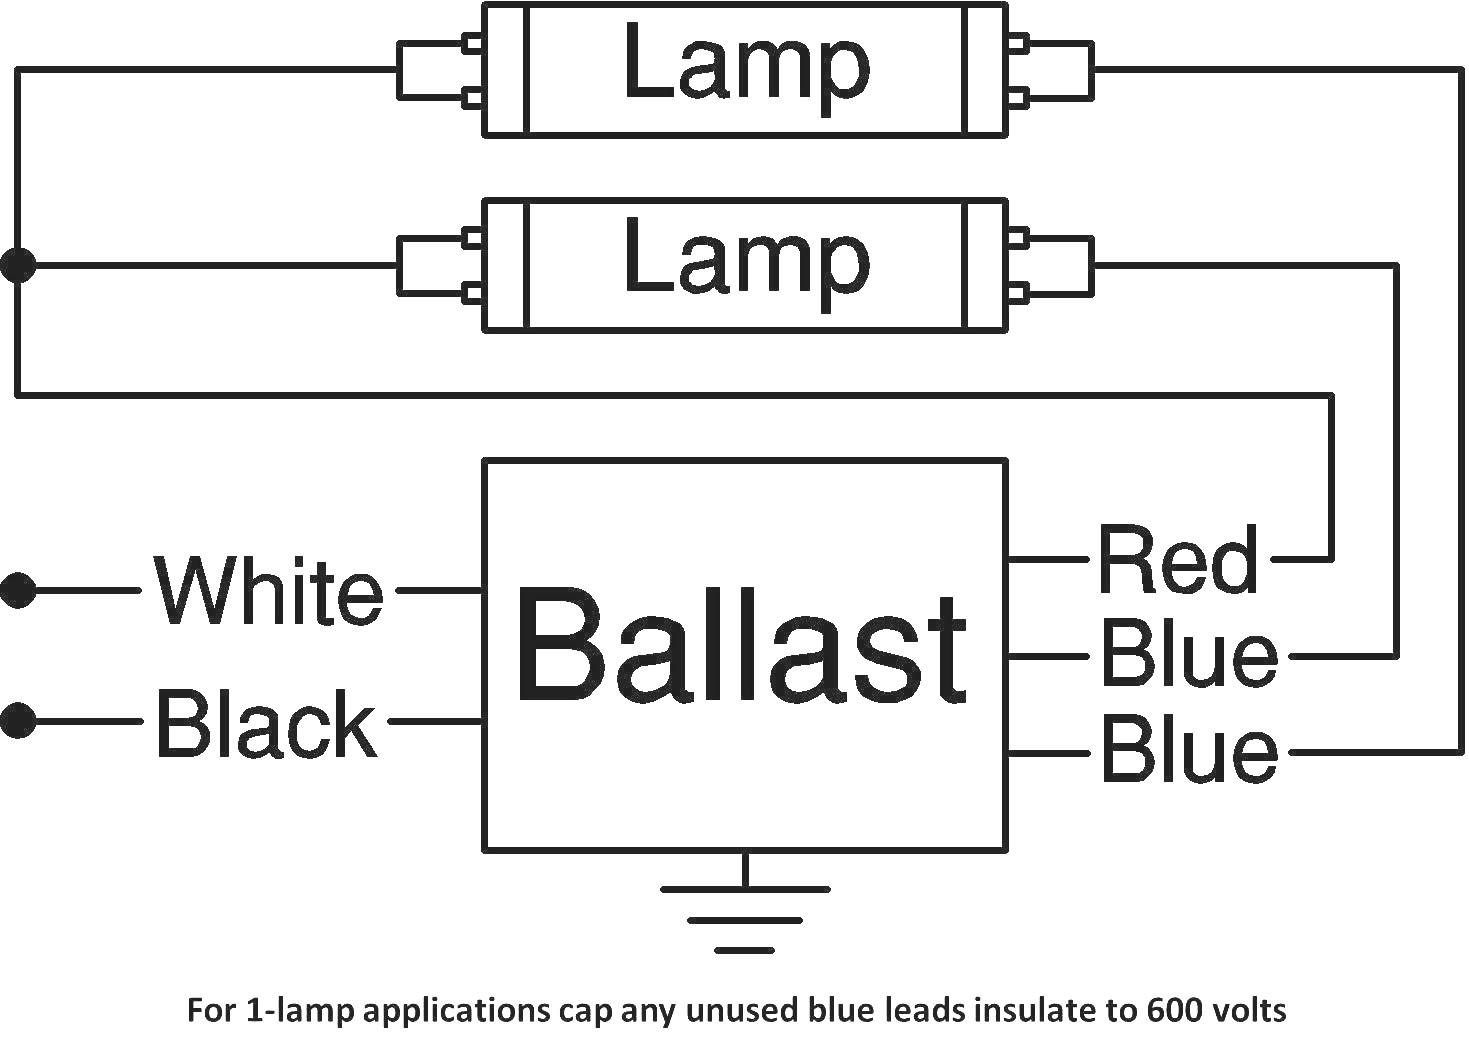 [SCHEMATICS_44OR]  CD_4421] Philips Advance Ballast Wiring Diagram Schematic Wiring | T8 Ballast Wiring Diagram For Icn 2p32 N |  | Unec Cette Mohammedshrine Librar Wiring 101